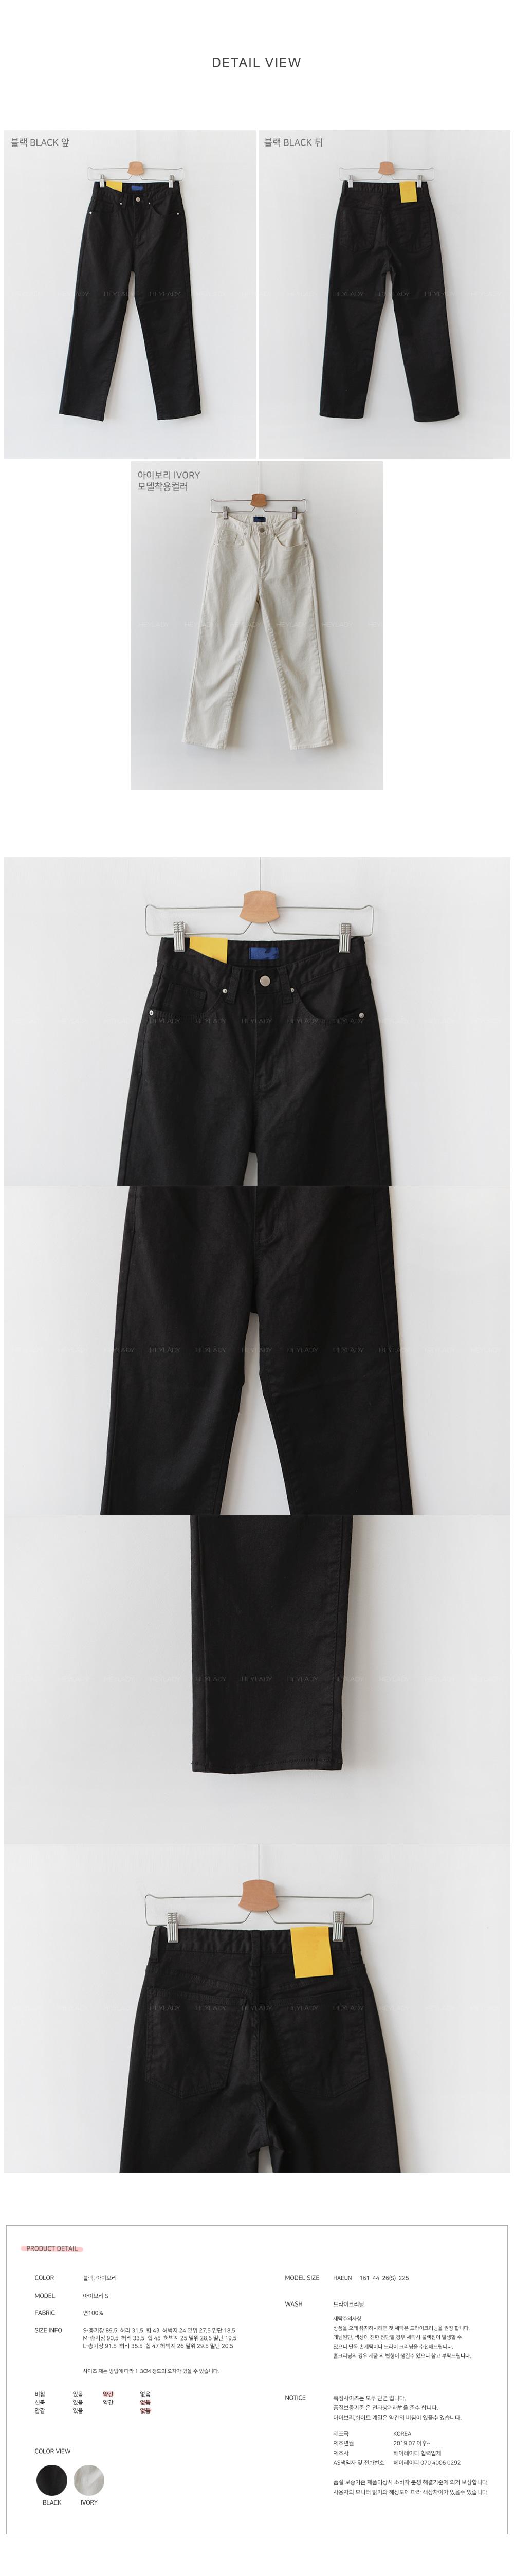 Burnings Date Cotton Pants